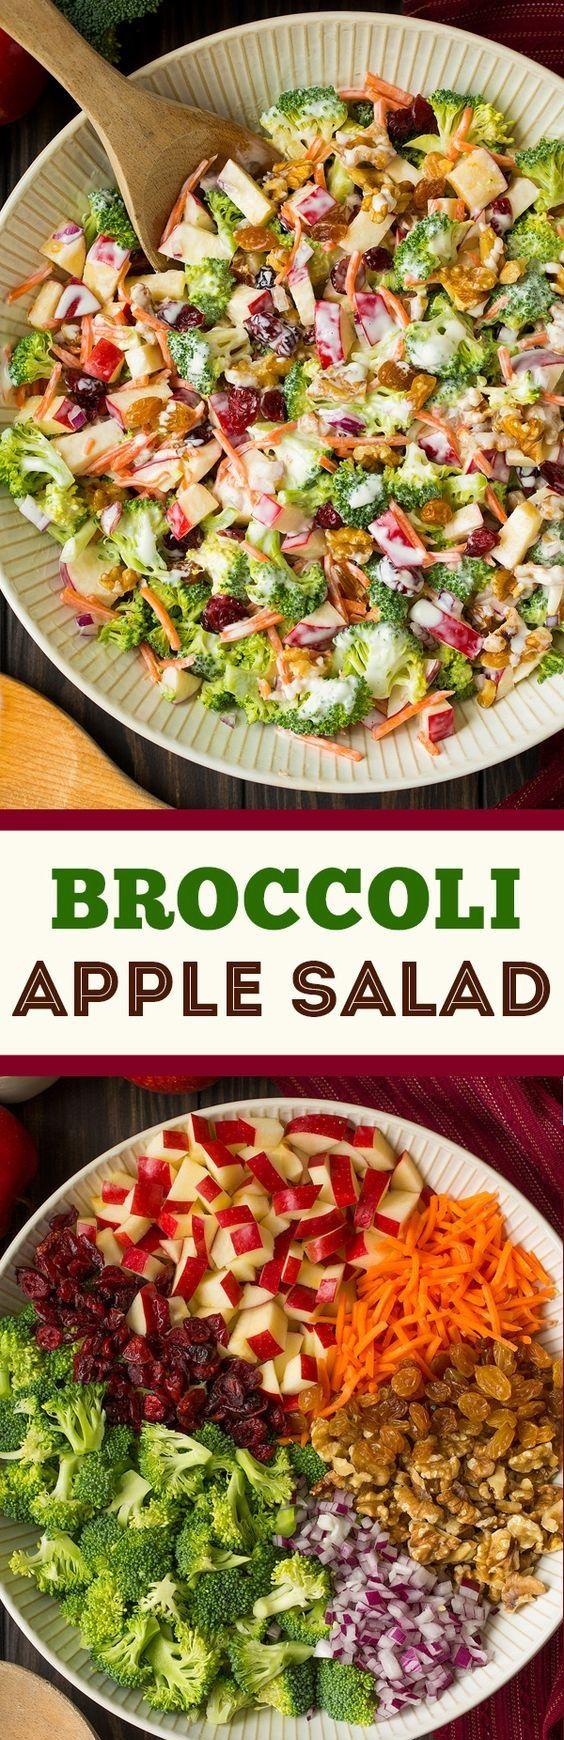 Broccoli Apple Salad | Pechenuhi